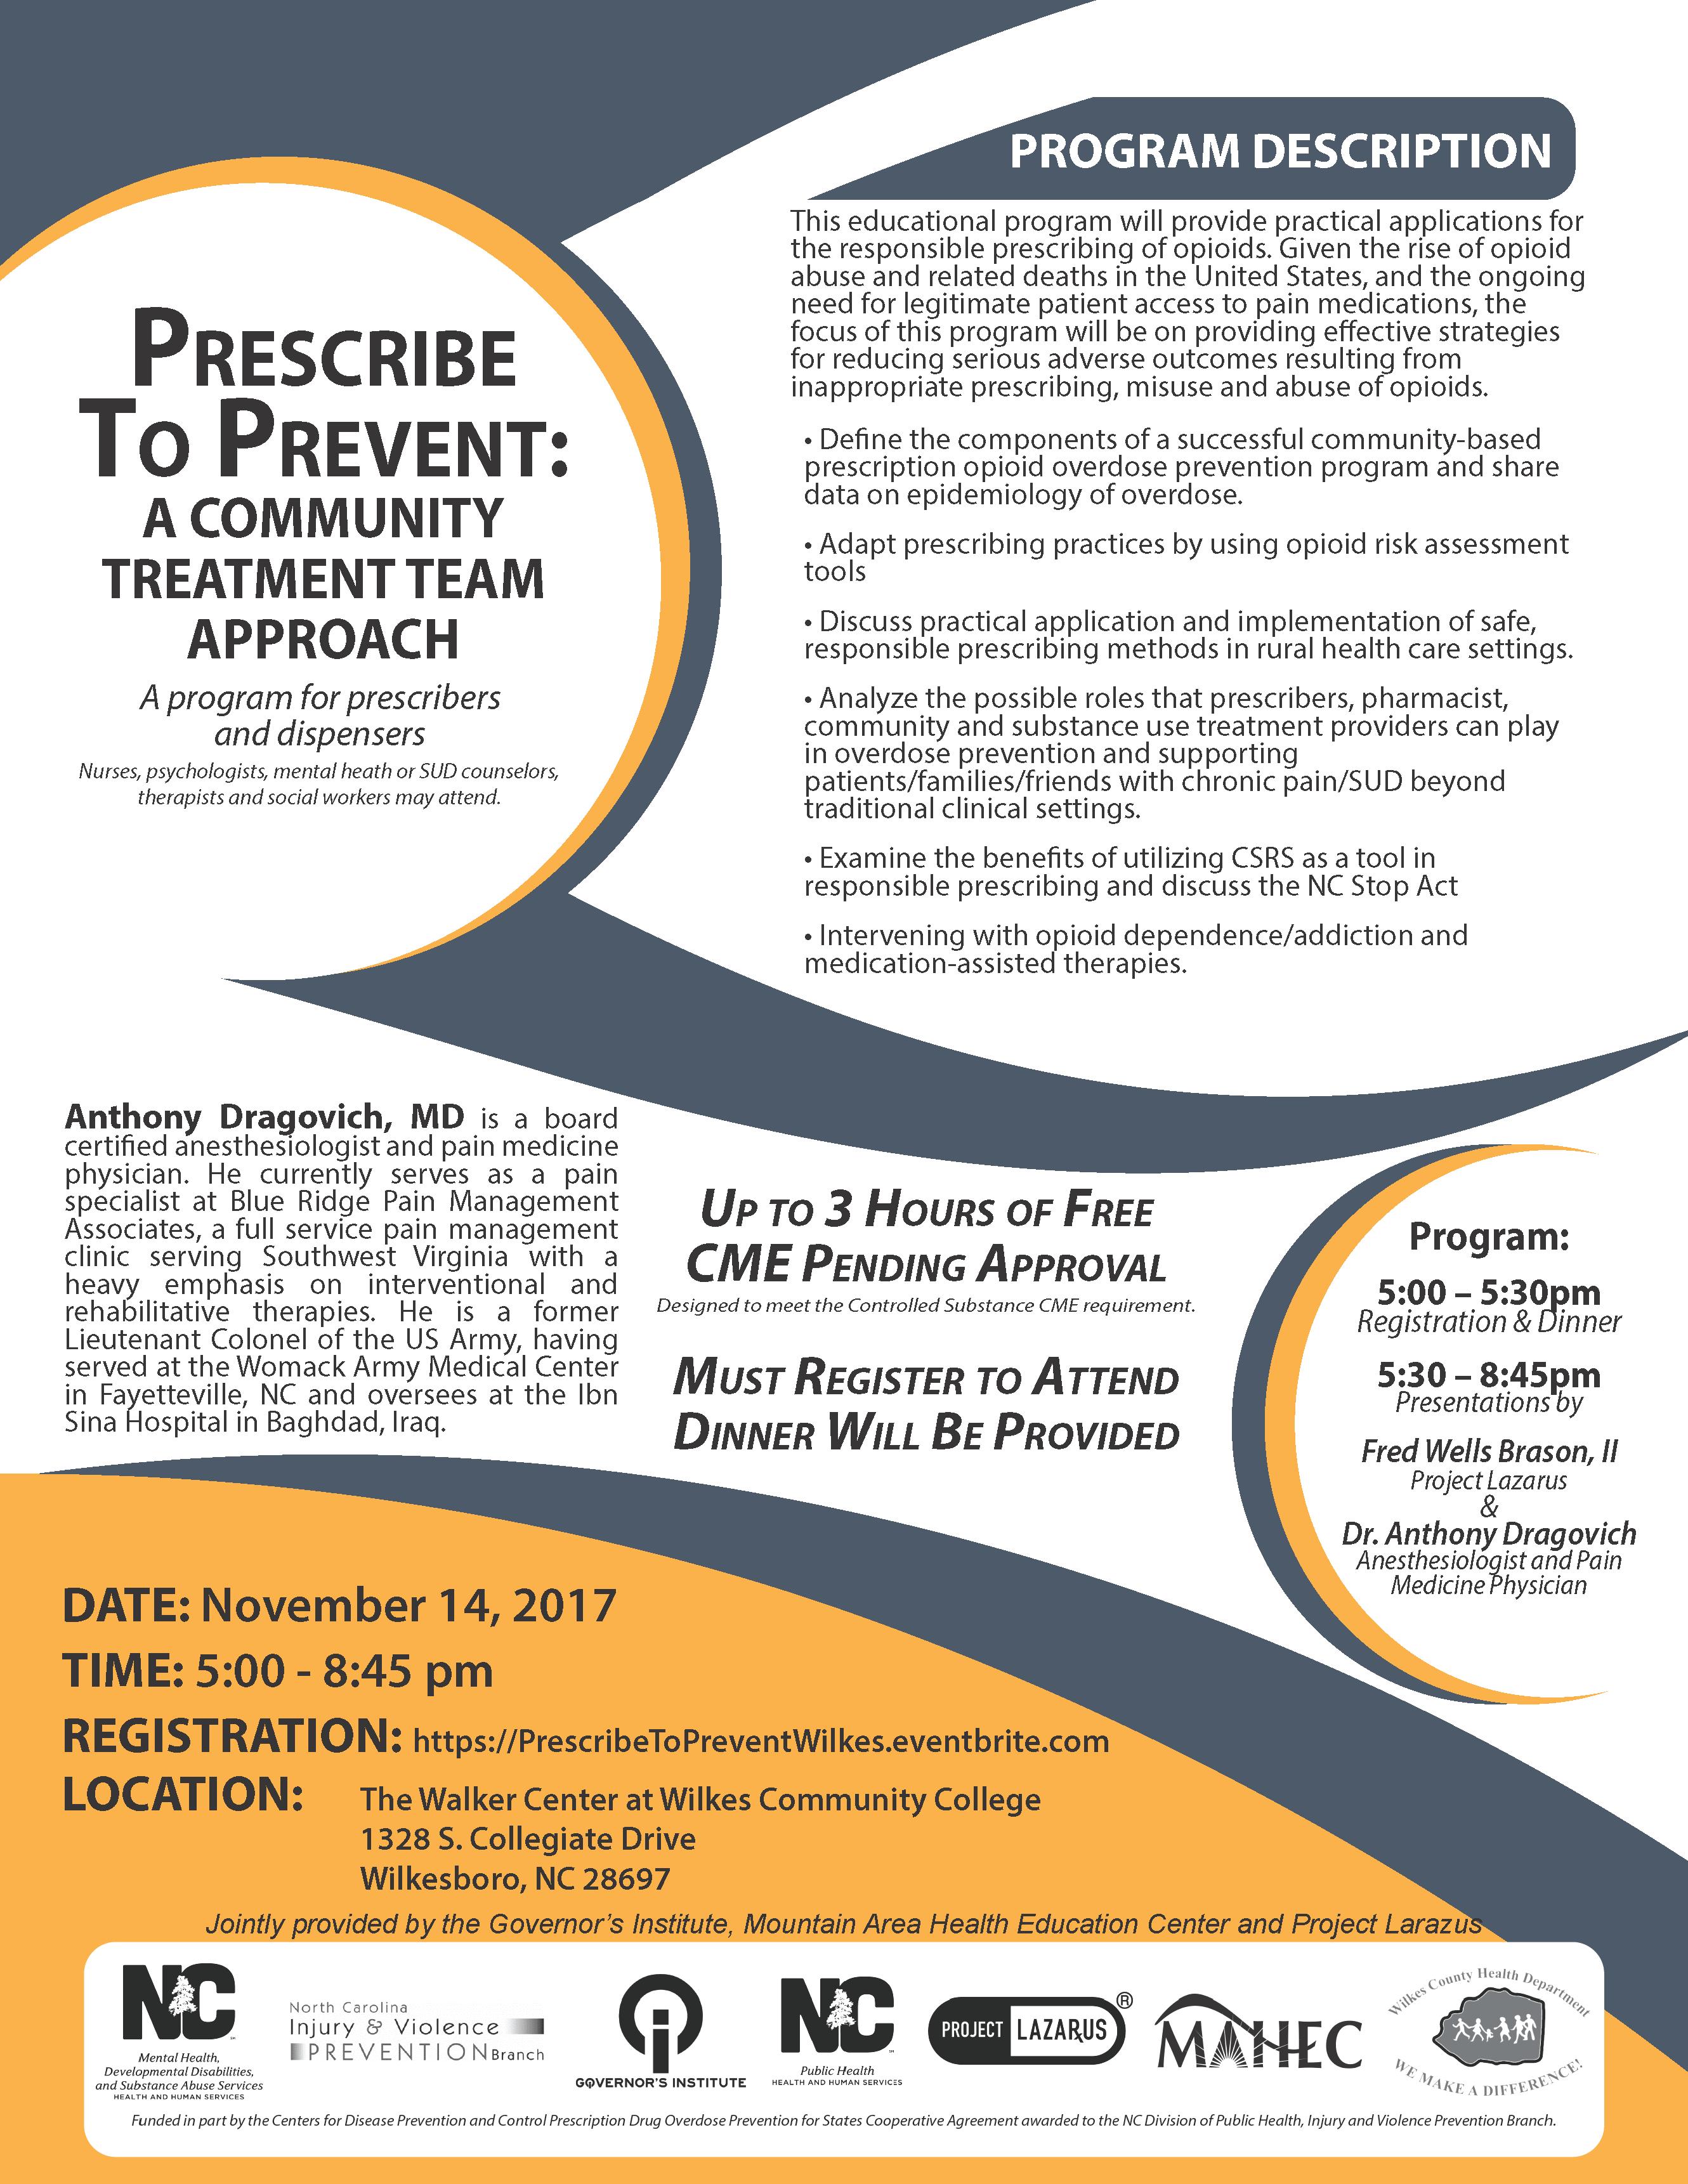 Prescribe to Prevent Event Flyer